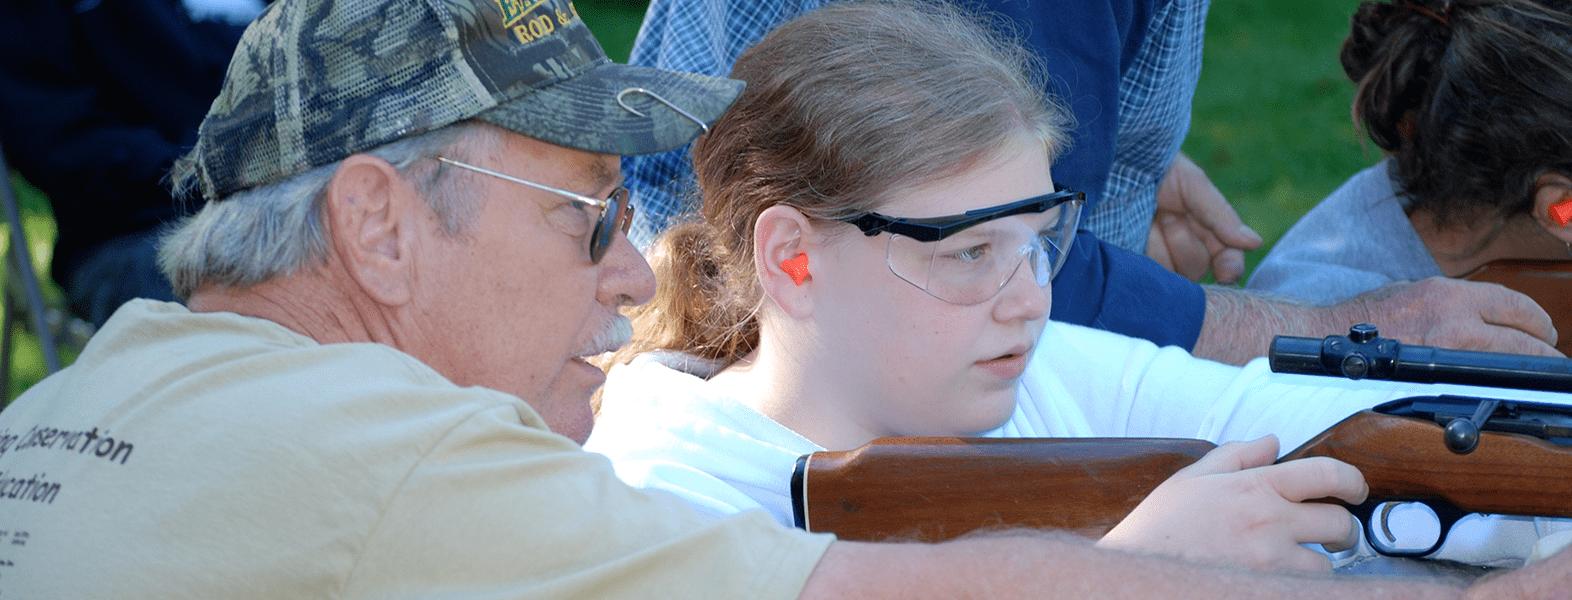 Northampton County Junior Conservation School - Conservation Through Education